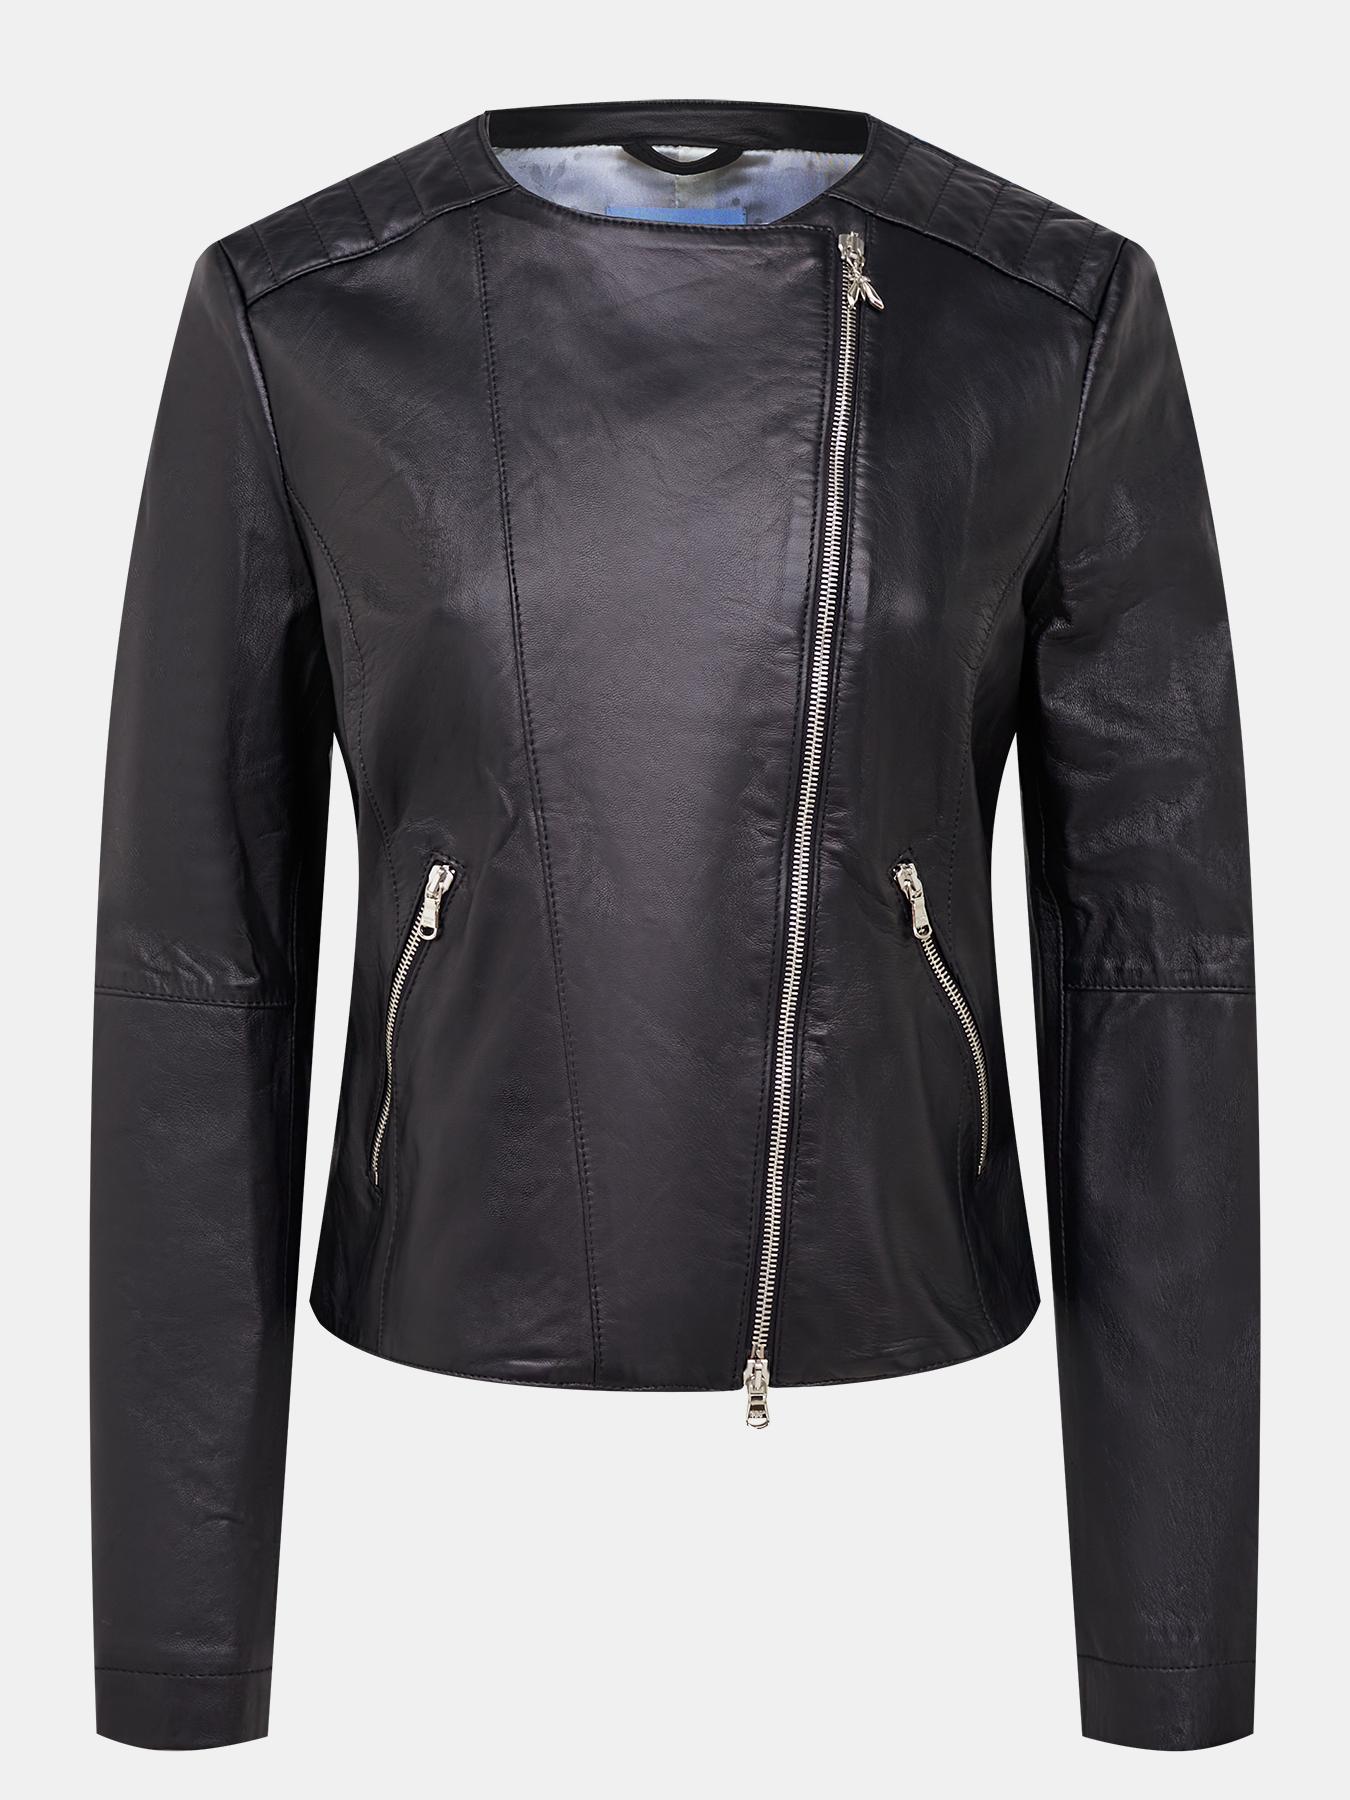 Фото - Кожаные куртки Patrizia Pepe Кожаная куртка patrizia pepe куртка